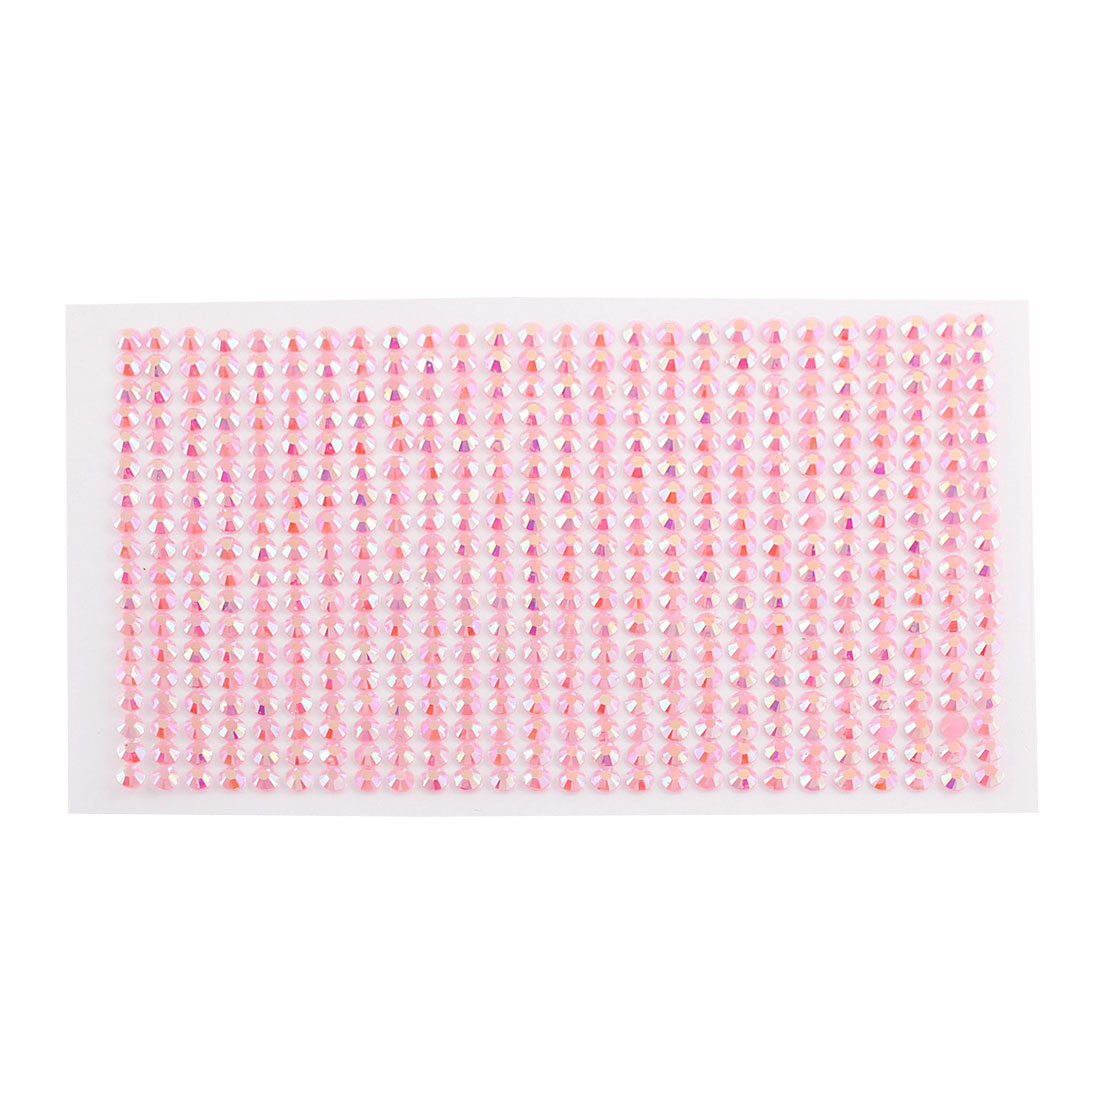 5mm Round Self Adhesive Sparkly Crystal Rhinestone DIY Stickers Pink